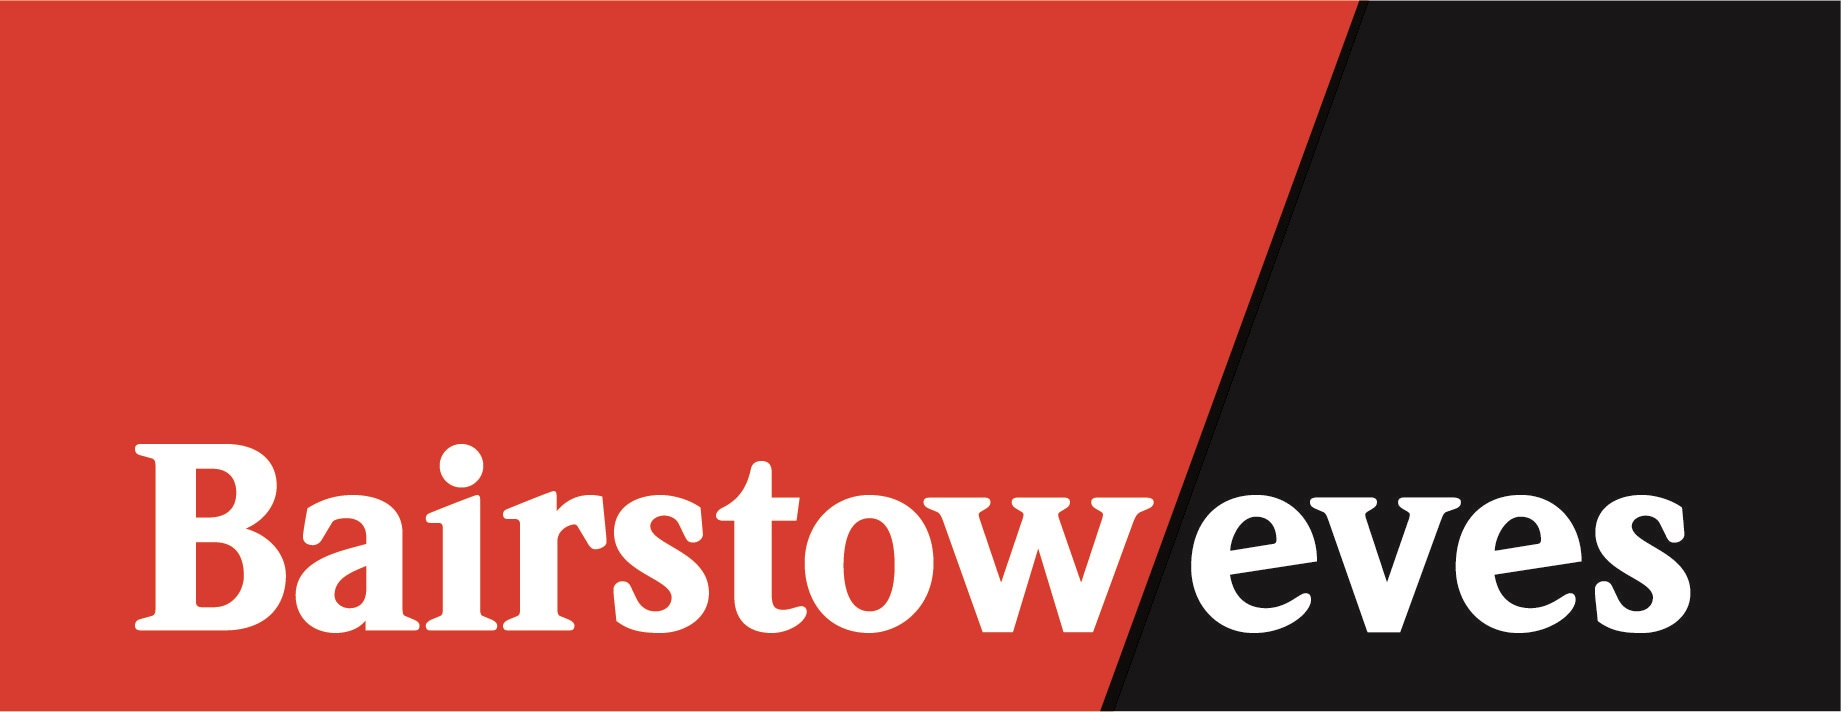 CW - Bairstow Eves - Sutton in Ashfield